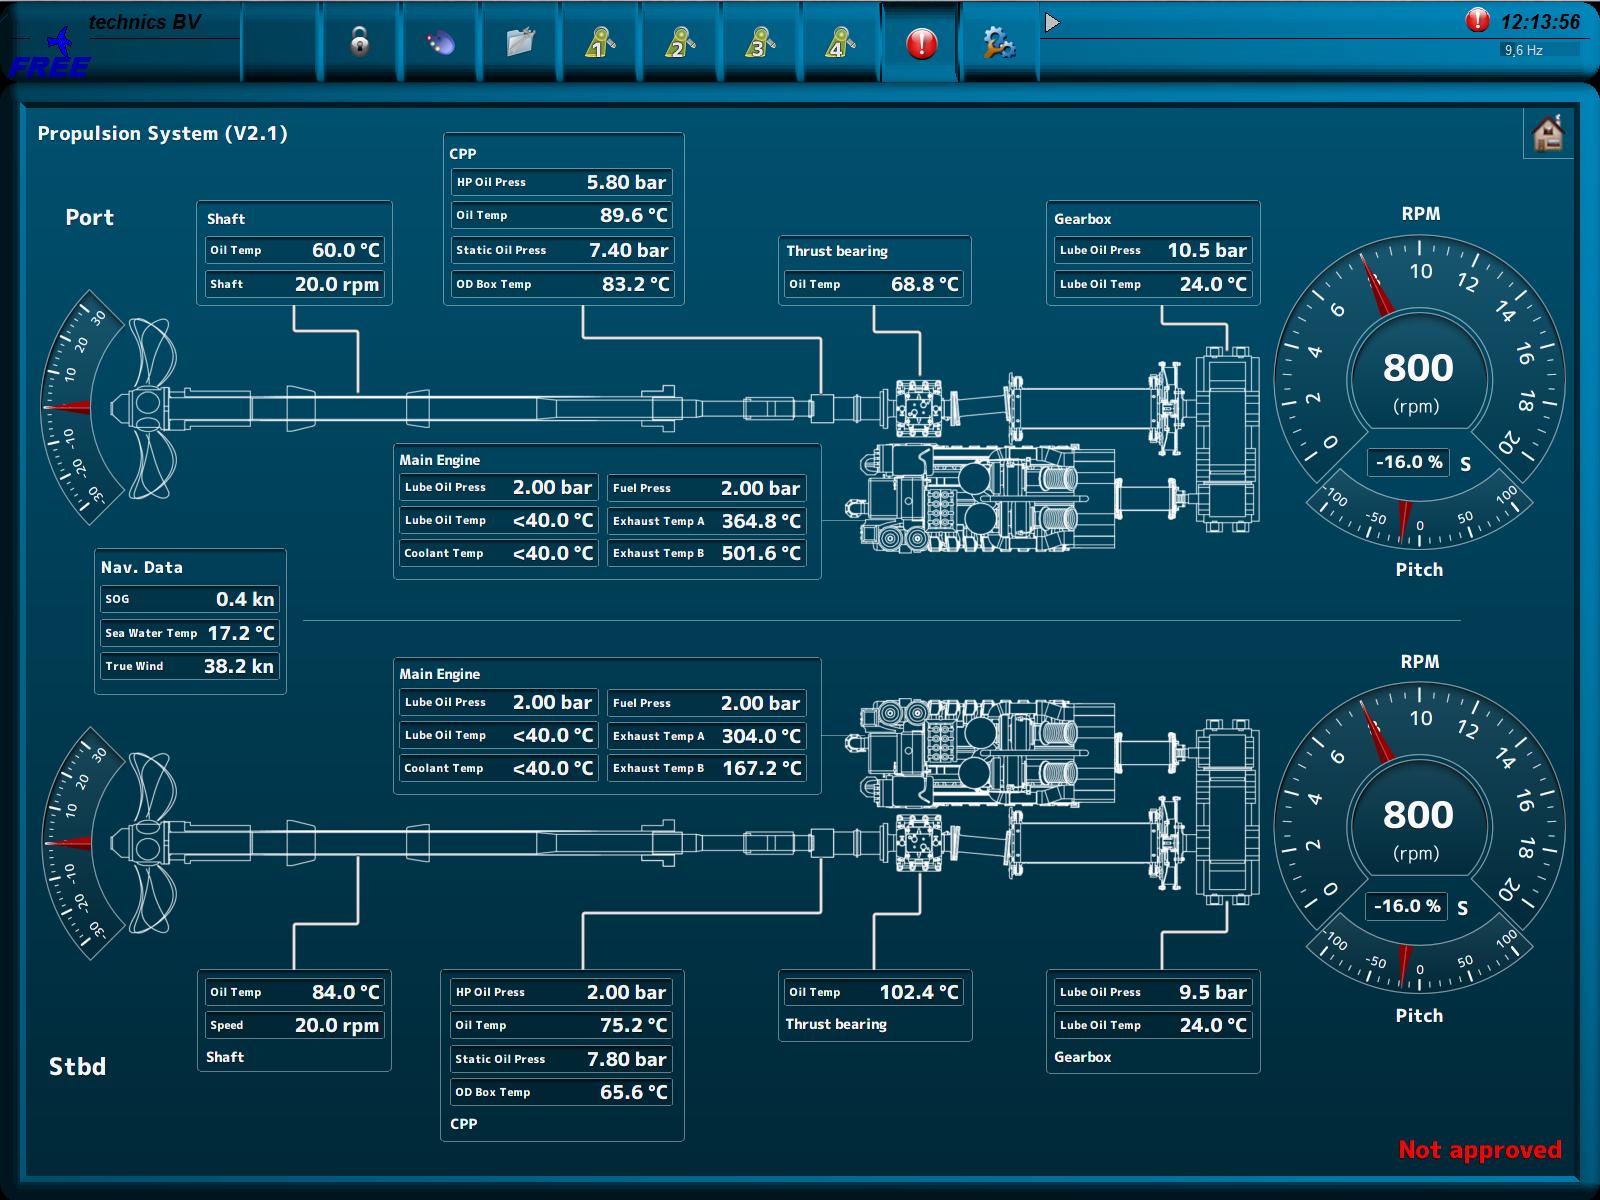 Mitsubishi Diesel Engine K4n Y231nsa K4n Y231nsb Operators Manual 8756 P in addition Leader also Page2 furthermore Hatz Engine 1d30 1d40 1d41 A1d35 A1d40 A1d41 1d60 1d80 Parts Manual 3294 P further Viewtopic. on engine diagrams